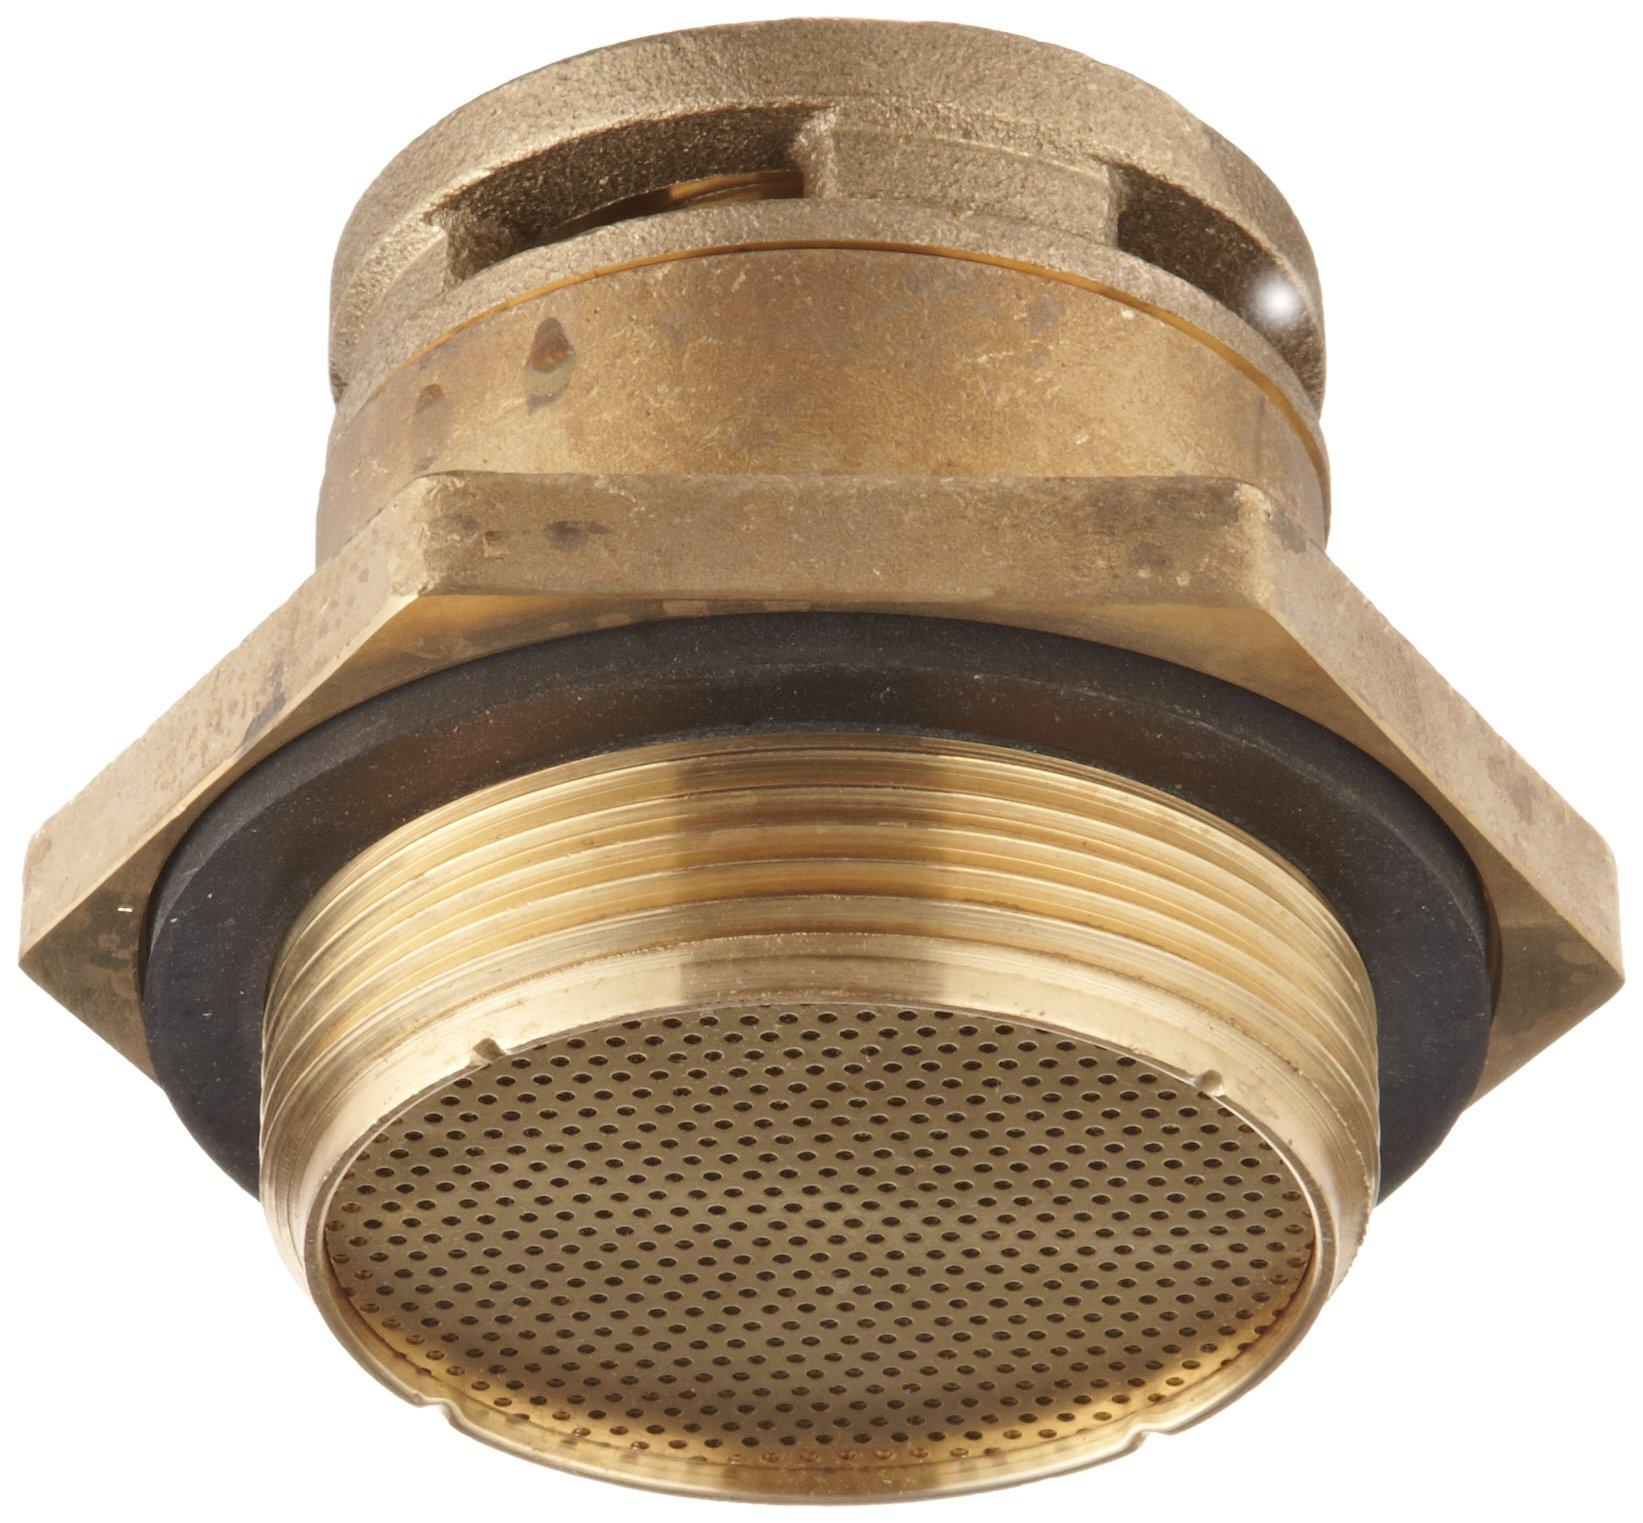 Justrite 08101 2'' Npt Brass Justrite Drum Vent/Access